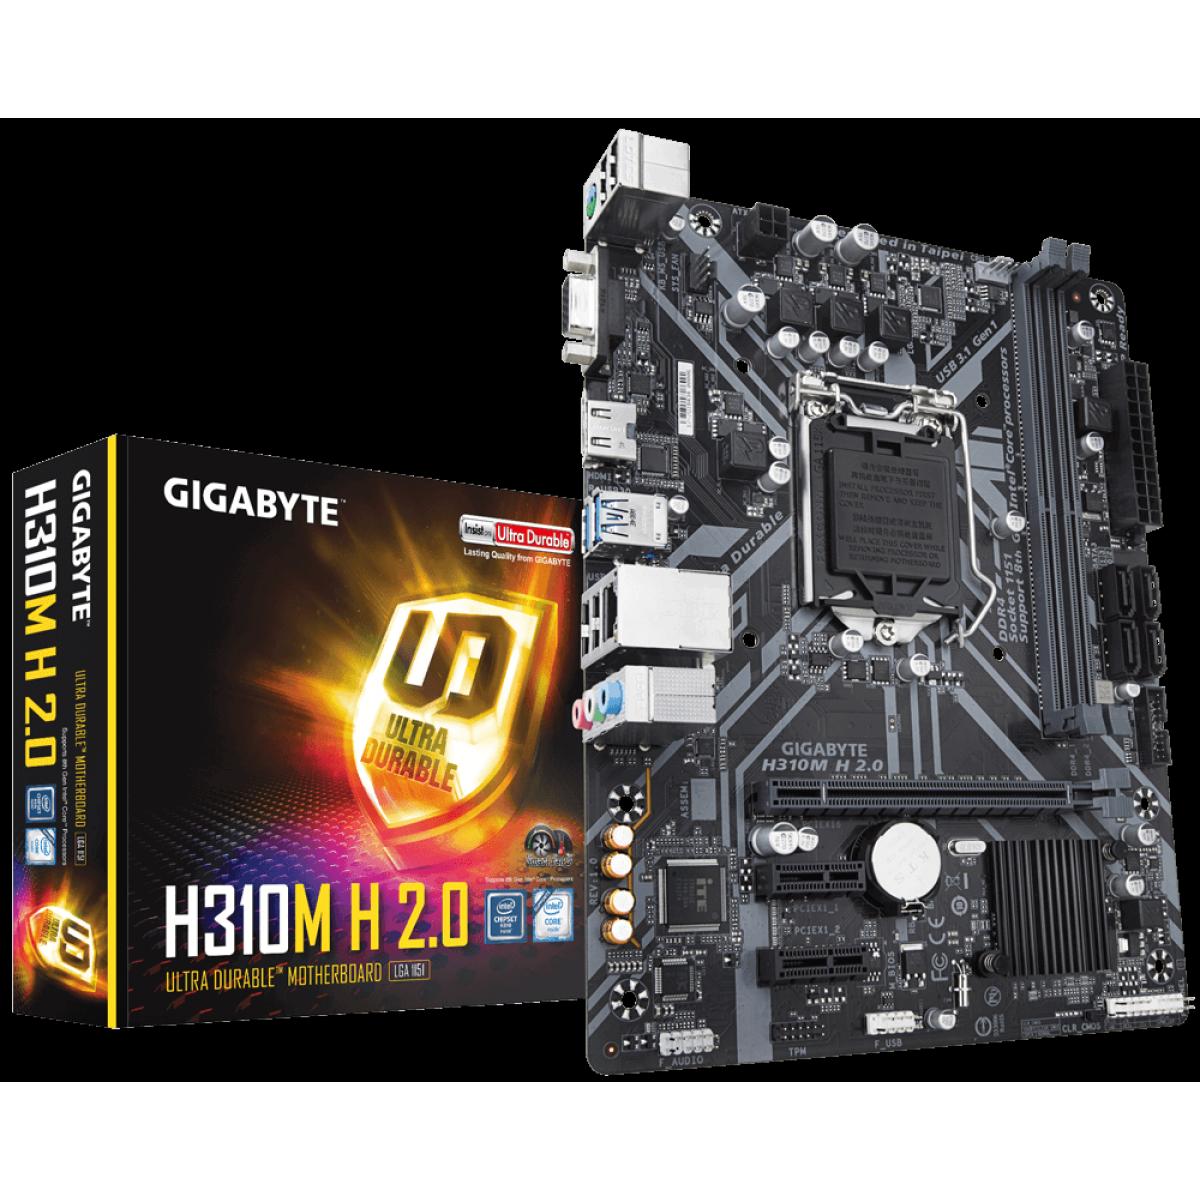 Placa Mãe Gigabyte H310M H 2.0, Chipset H310, Intel LGA 1151, mATX, DDR4